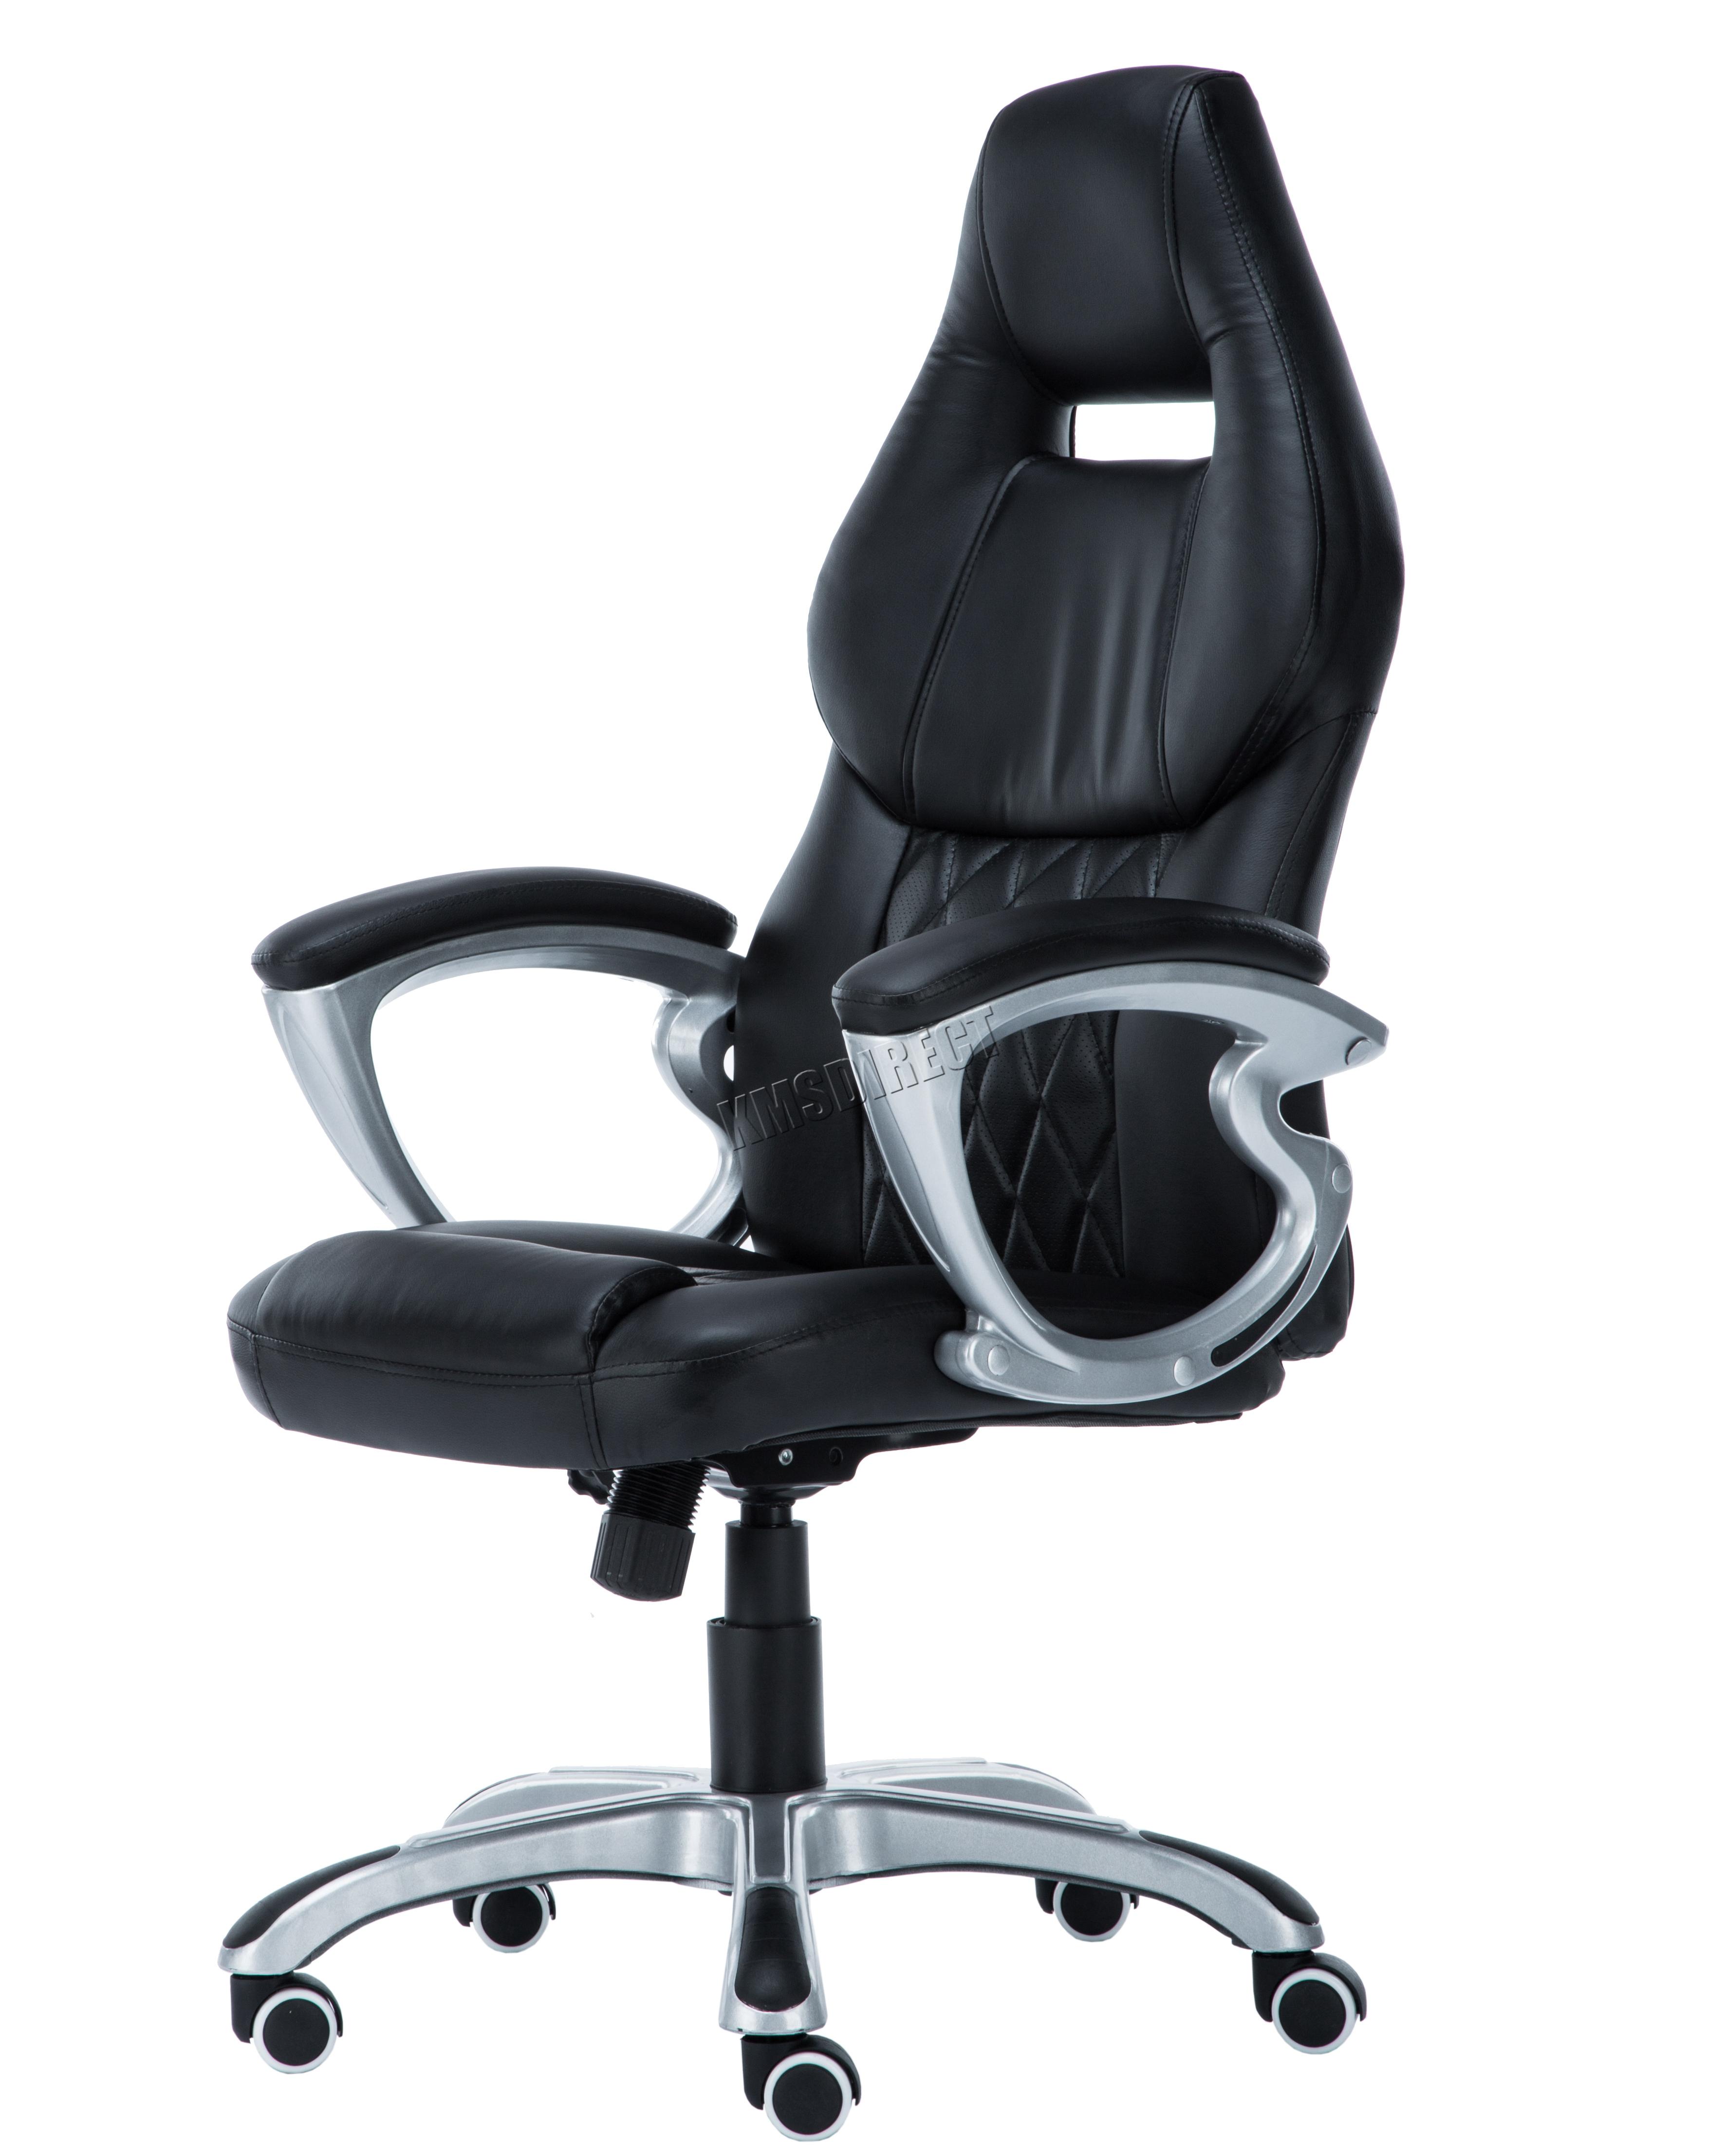 desk chair ebay uk hammock swing chairs foxhunter computer executive office pu leather